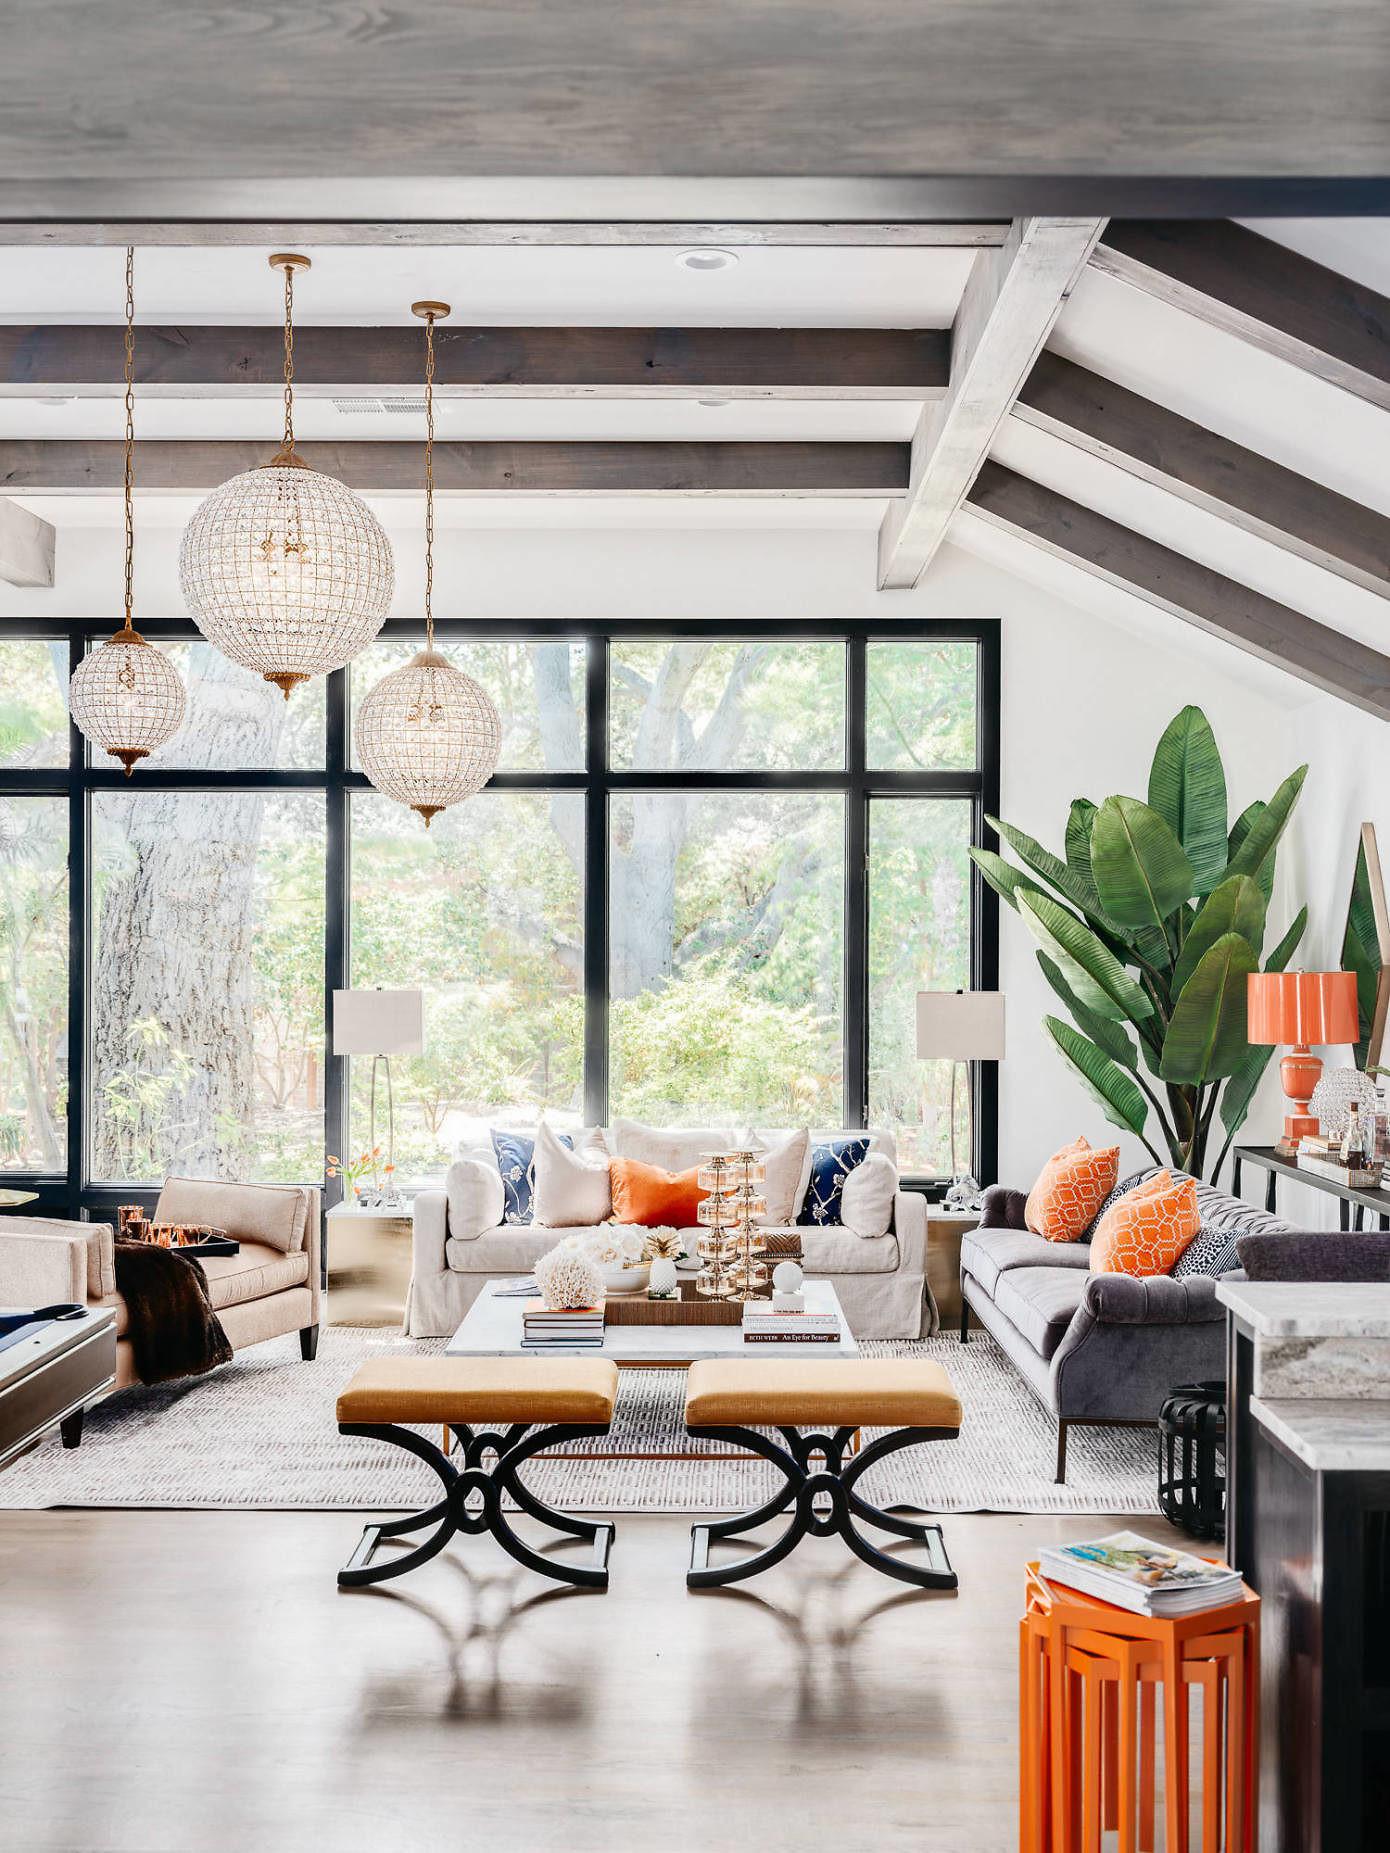 Modern Farmhouse by Golden Gate Kitchens